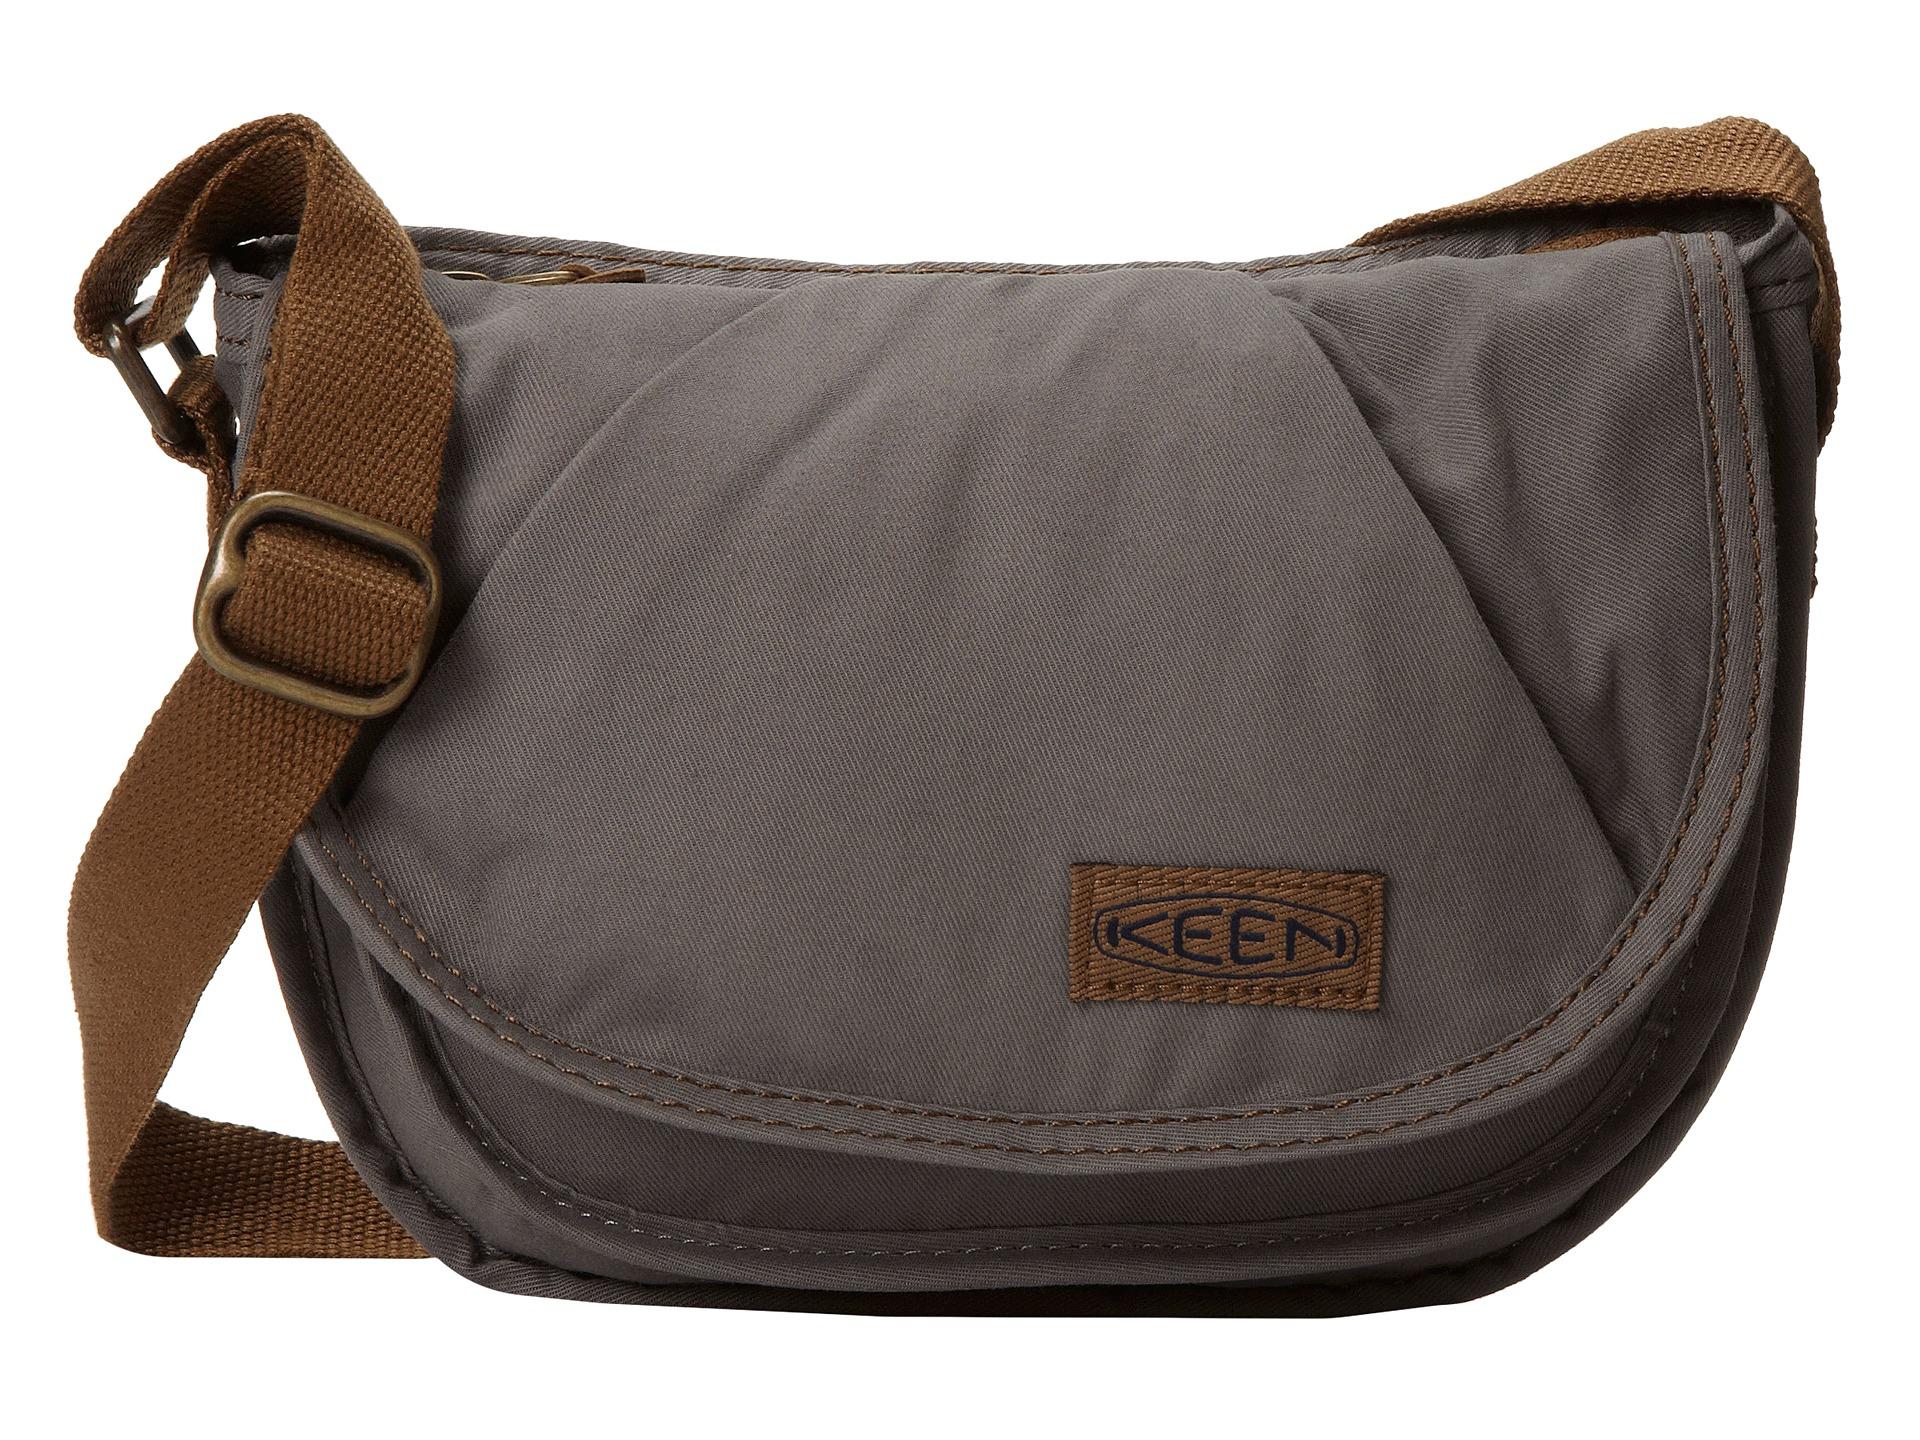 cabd9ec0ce2 Keen Montclair Mini Bag Brushed Twill in Gray - Lyst